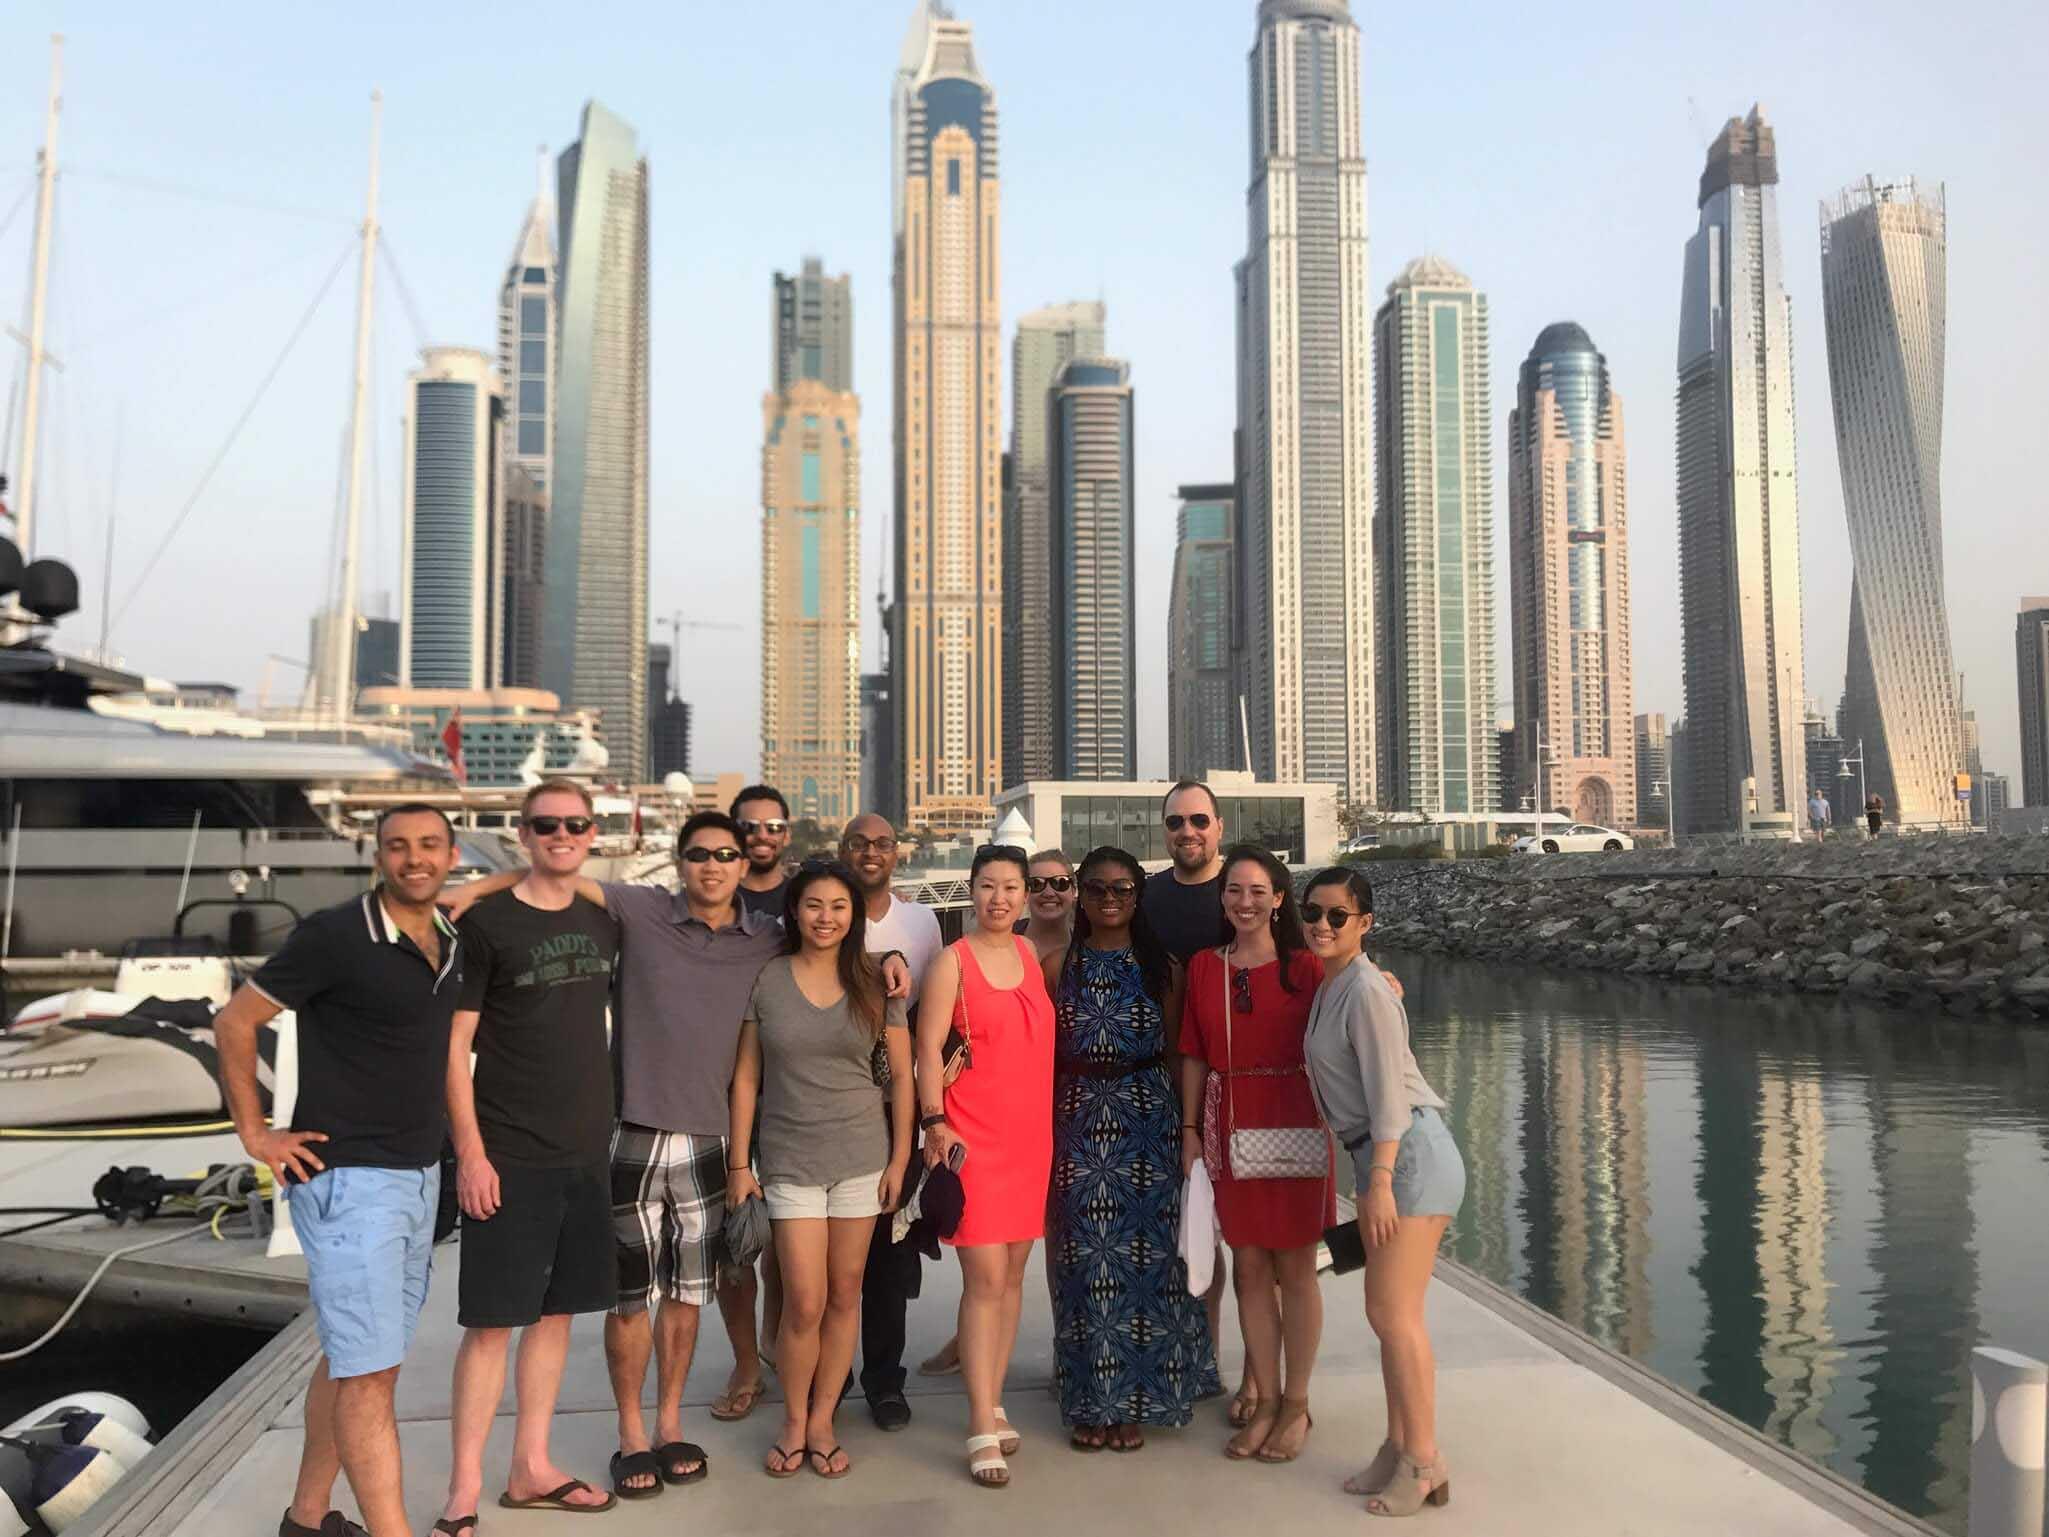 Fuqua students in Dubai